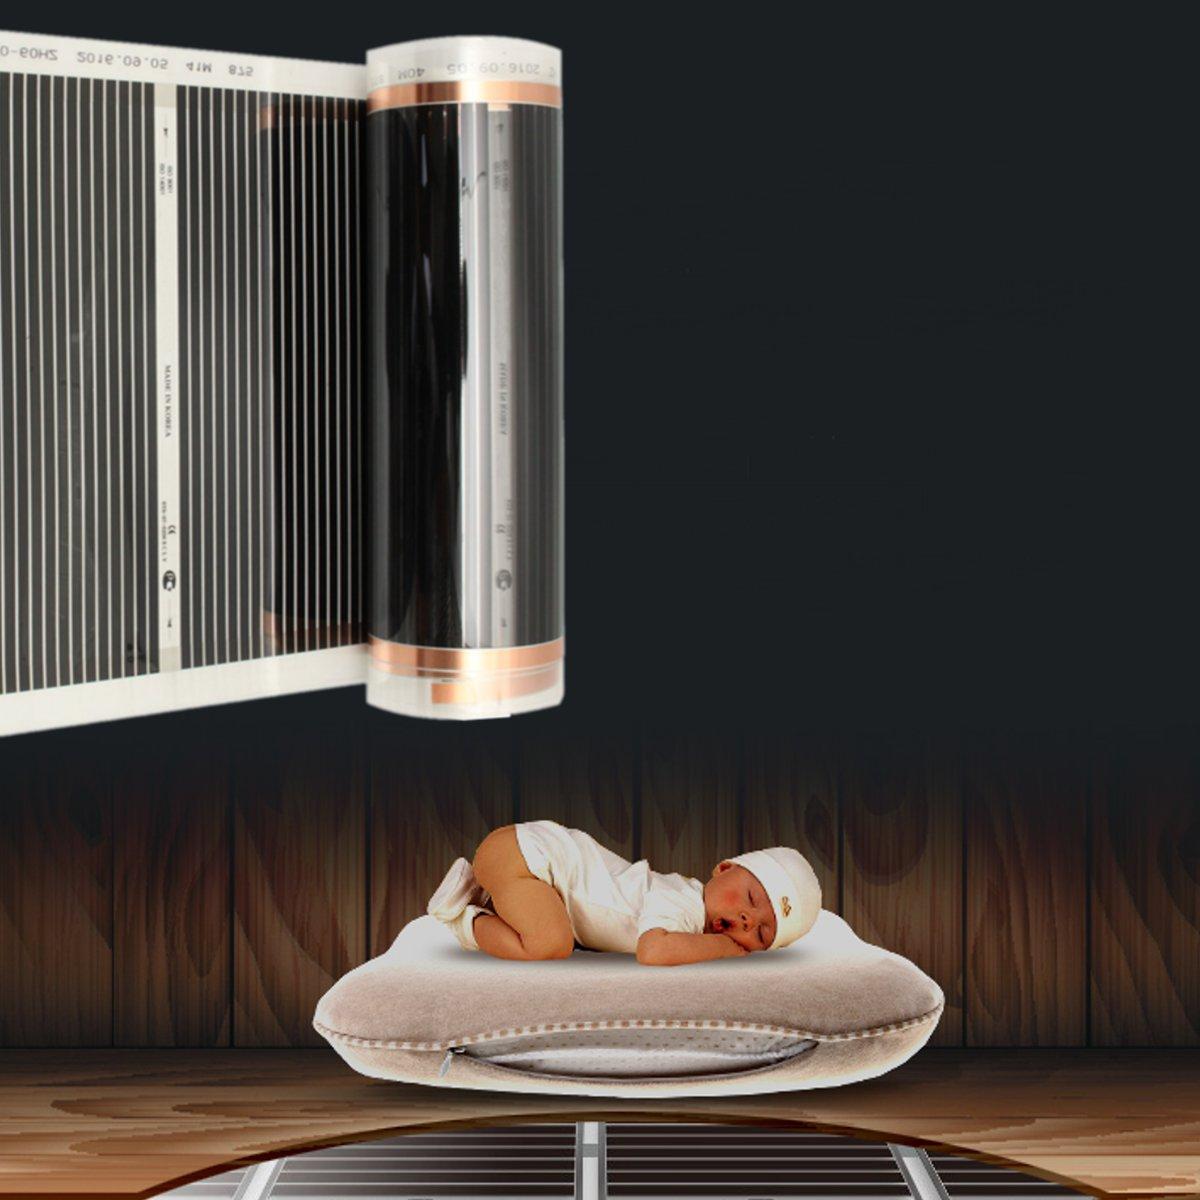 4pcs 50CM*2M One Square Meter Floor Heating Film (No accessories) Far Infrared Heating film Tool Warming Film Mat4pcs 50CM*2M One Square Meter Floor Heating Film (No accessories) Far Infrared Heating film Tool Warming Film Mat